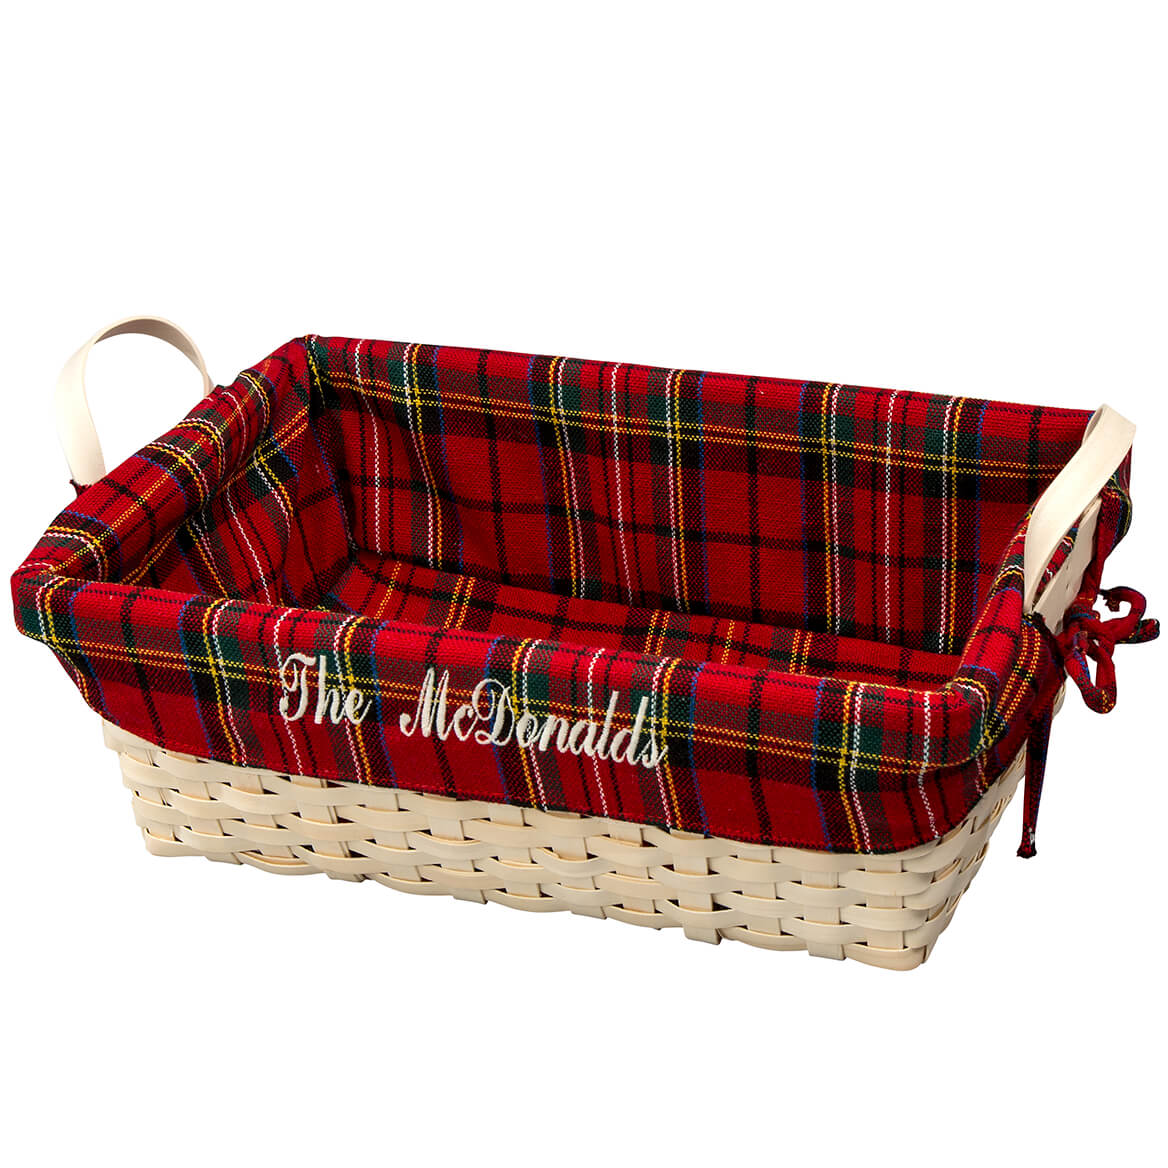 Personalized Christmas Basket-368419